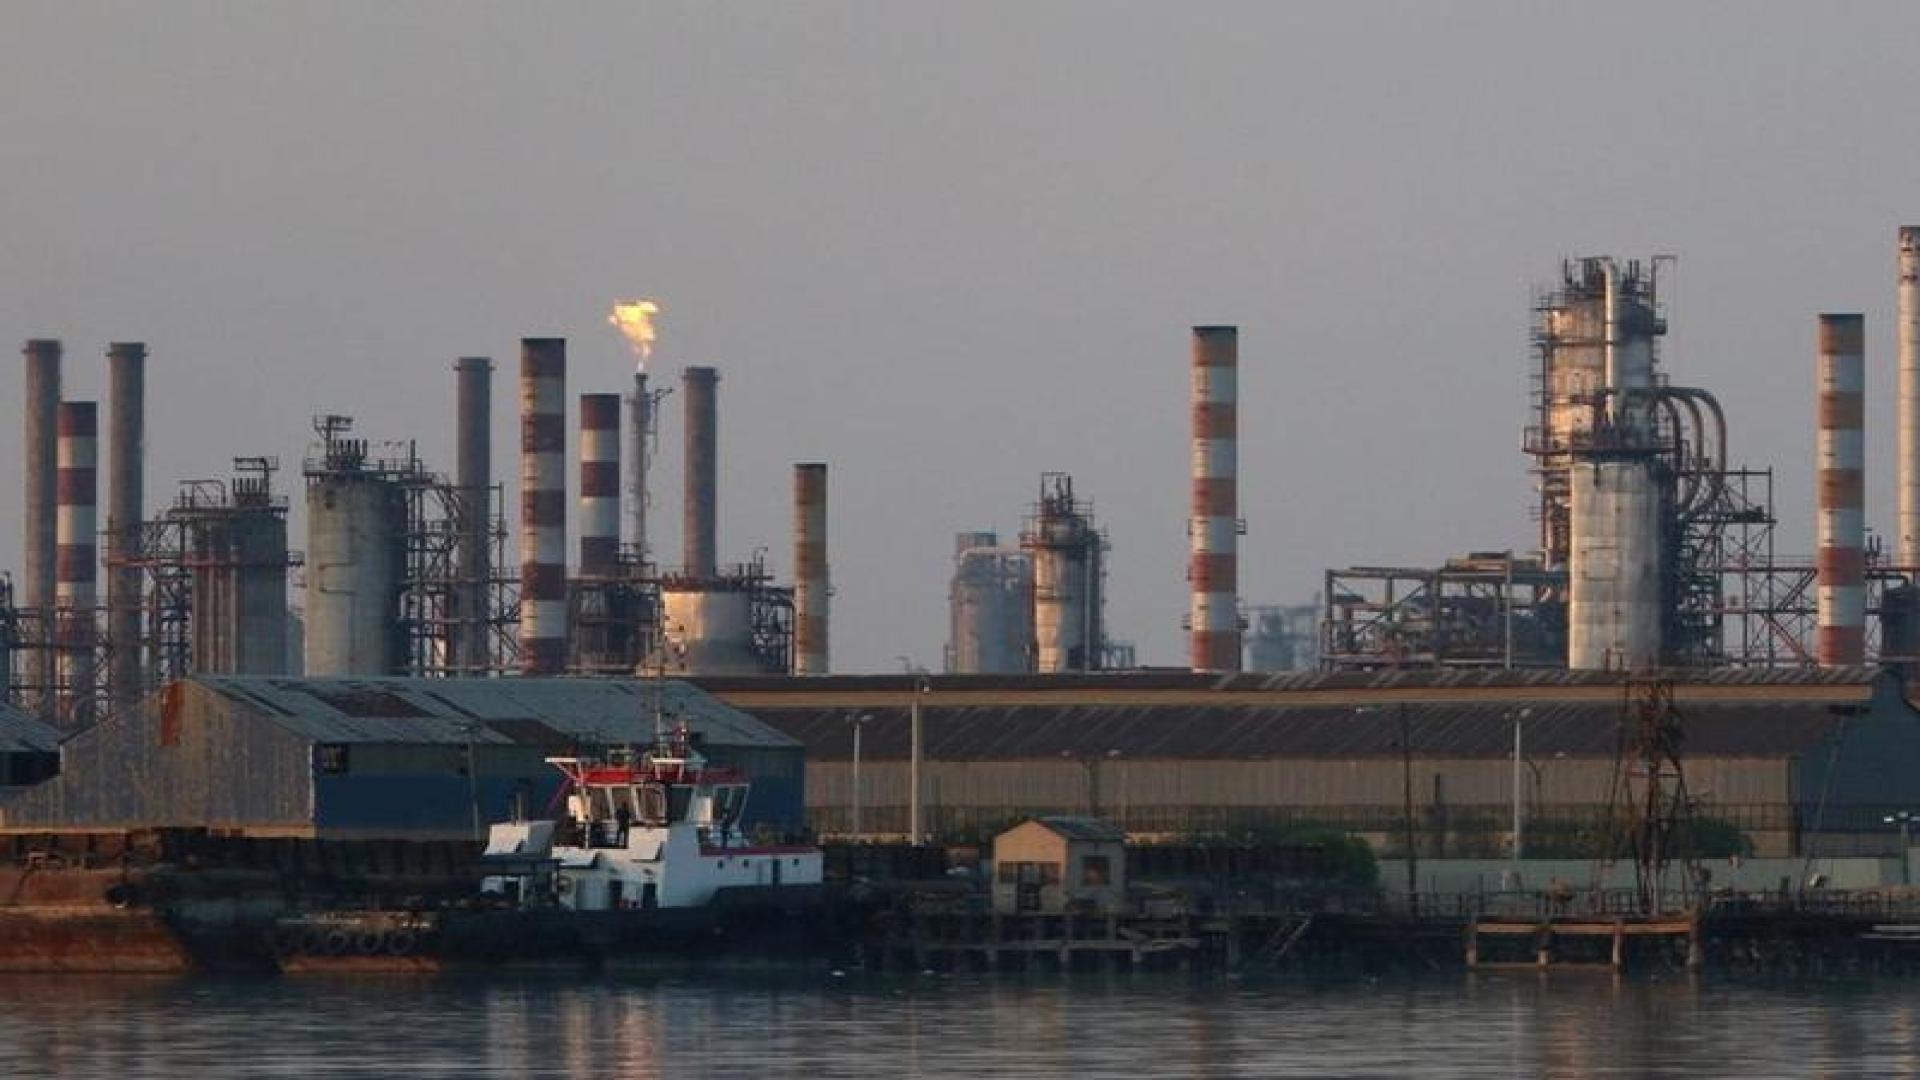 EEUU confisca 4 buques iraníes con gasolina que navegaban a Venezuela